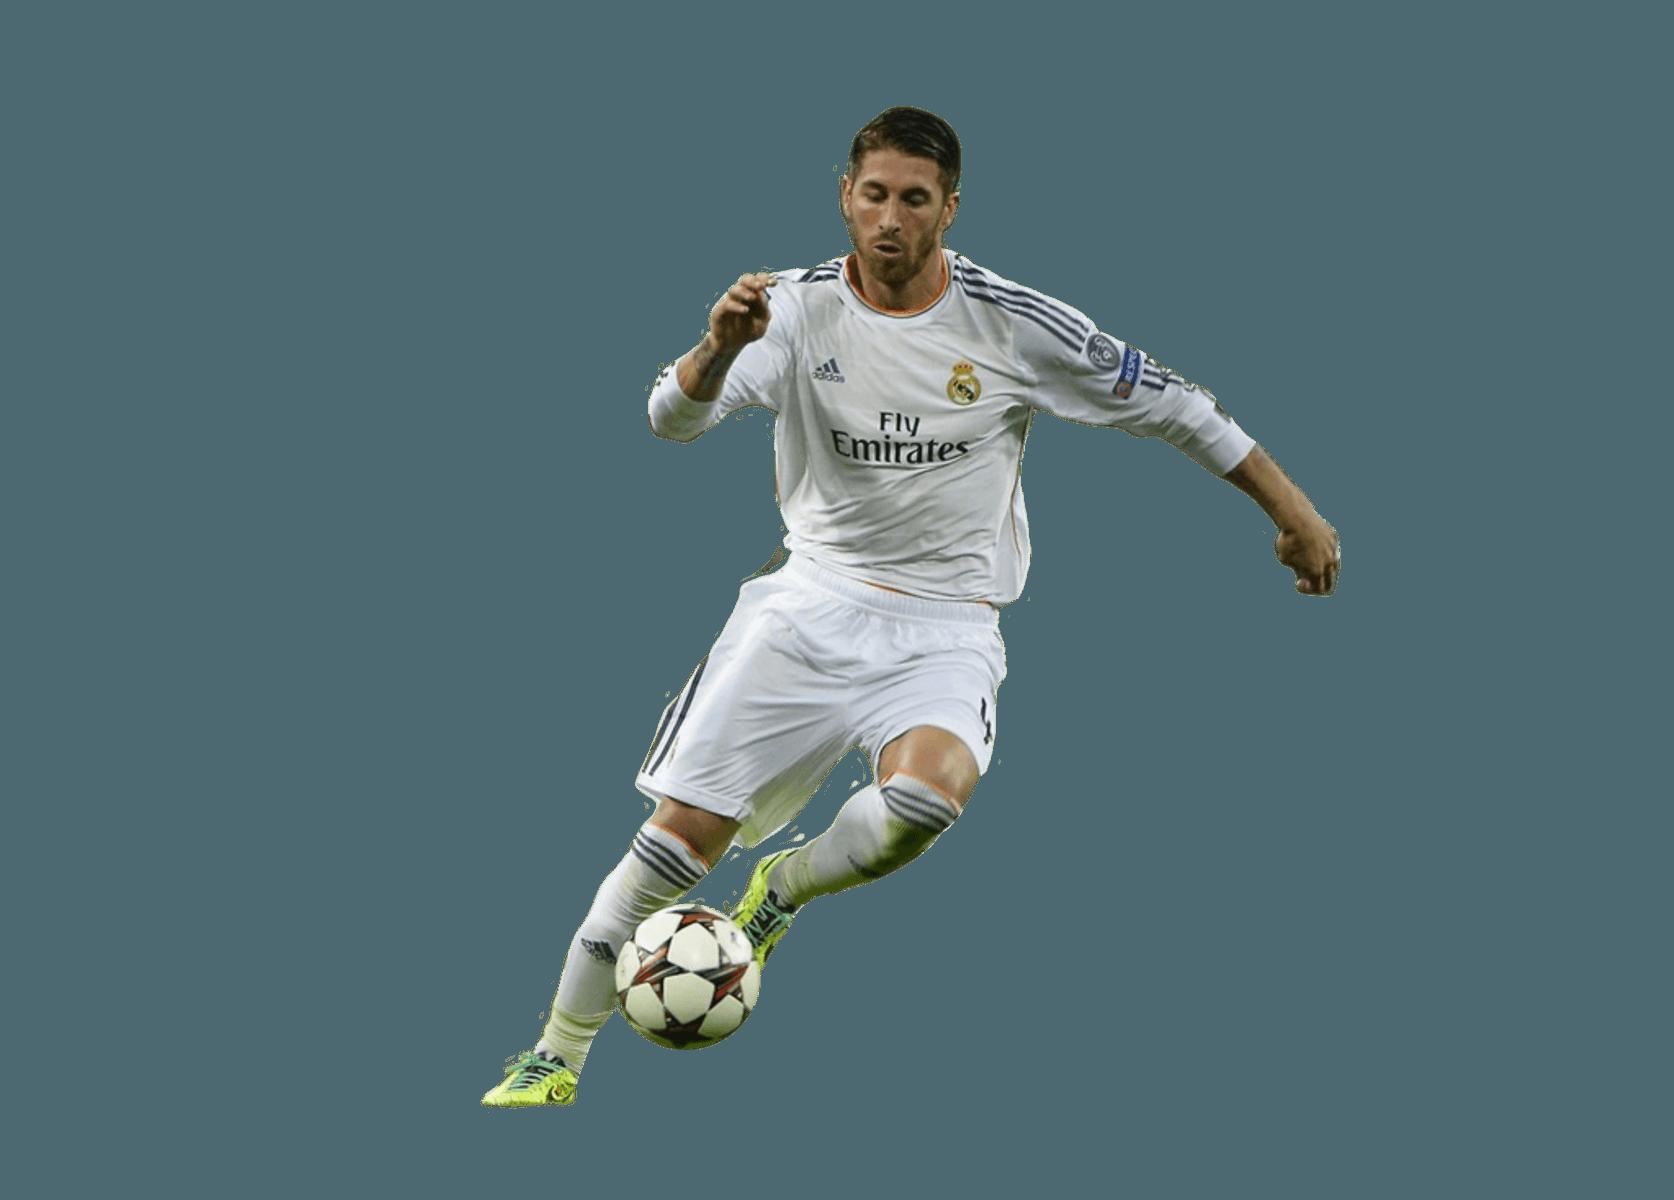 Ronaldo football players clipart psd vector black and white Sergio Ramos 2015 Wallpapers - Wallpaper Cave vector black and white